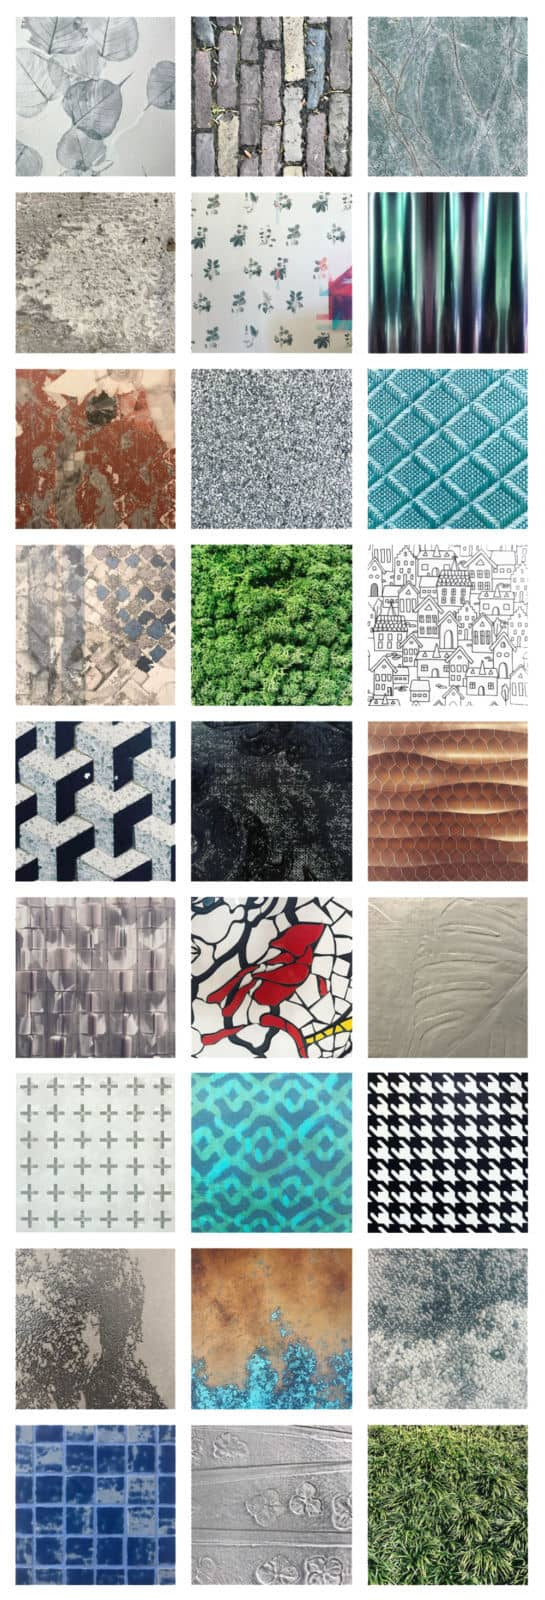 Fuorisalone 2017 in textures allyoucantexture